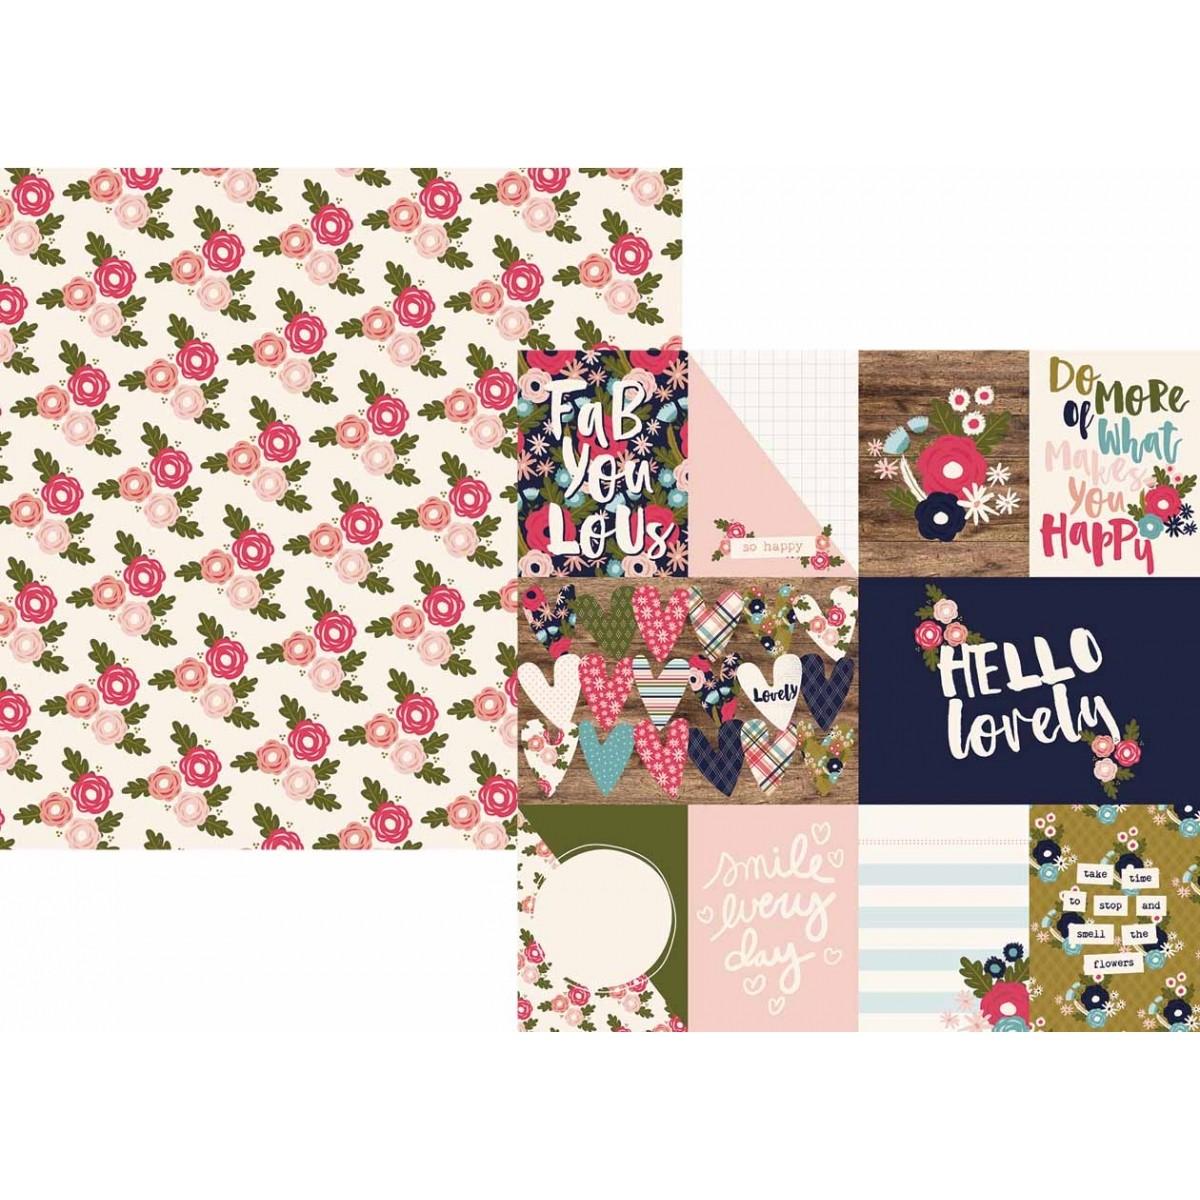 Papel Coleção Hello Lovely /  3x4 4x6 Journaling Cards - Simple Stories  - JuJu Scrapbook